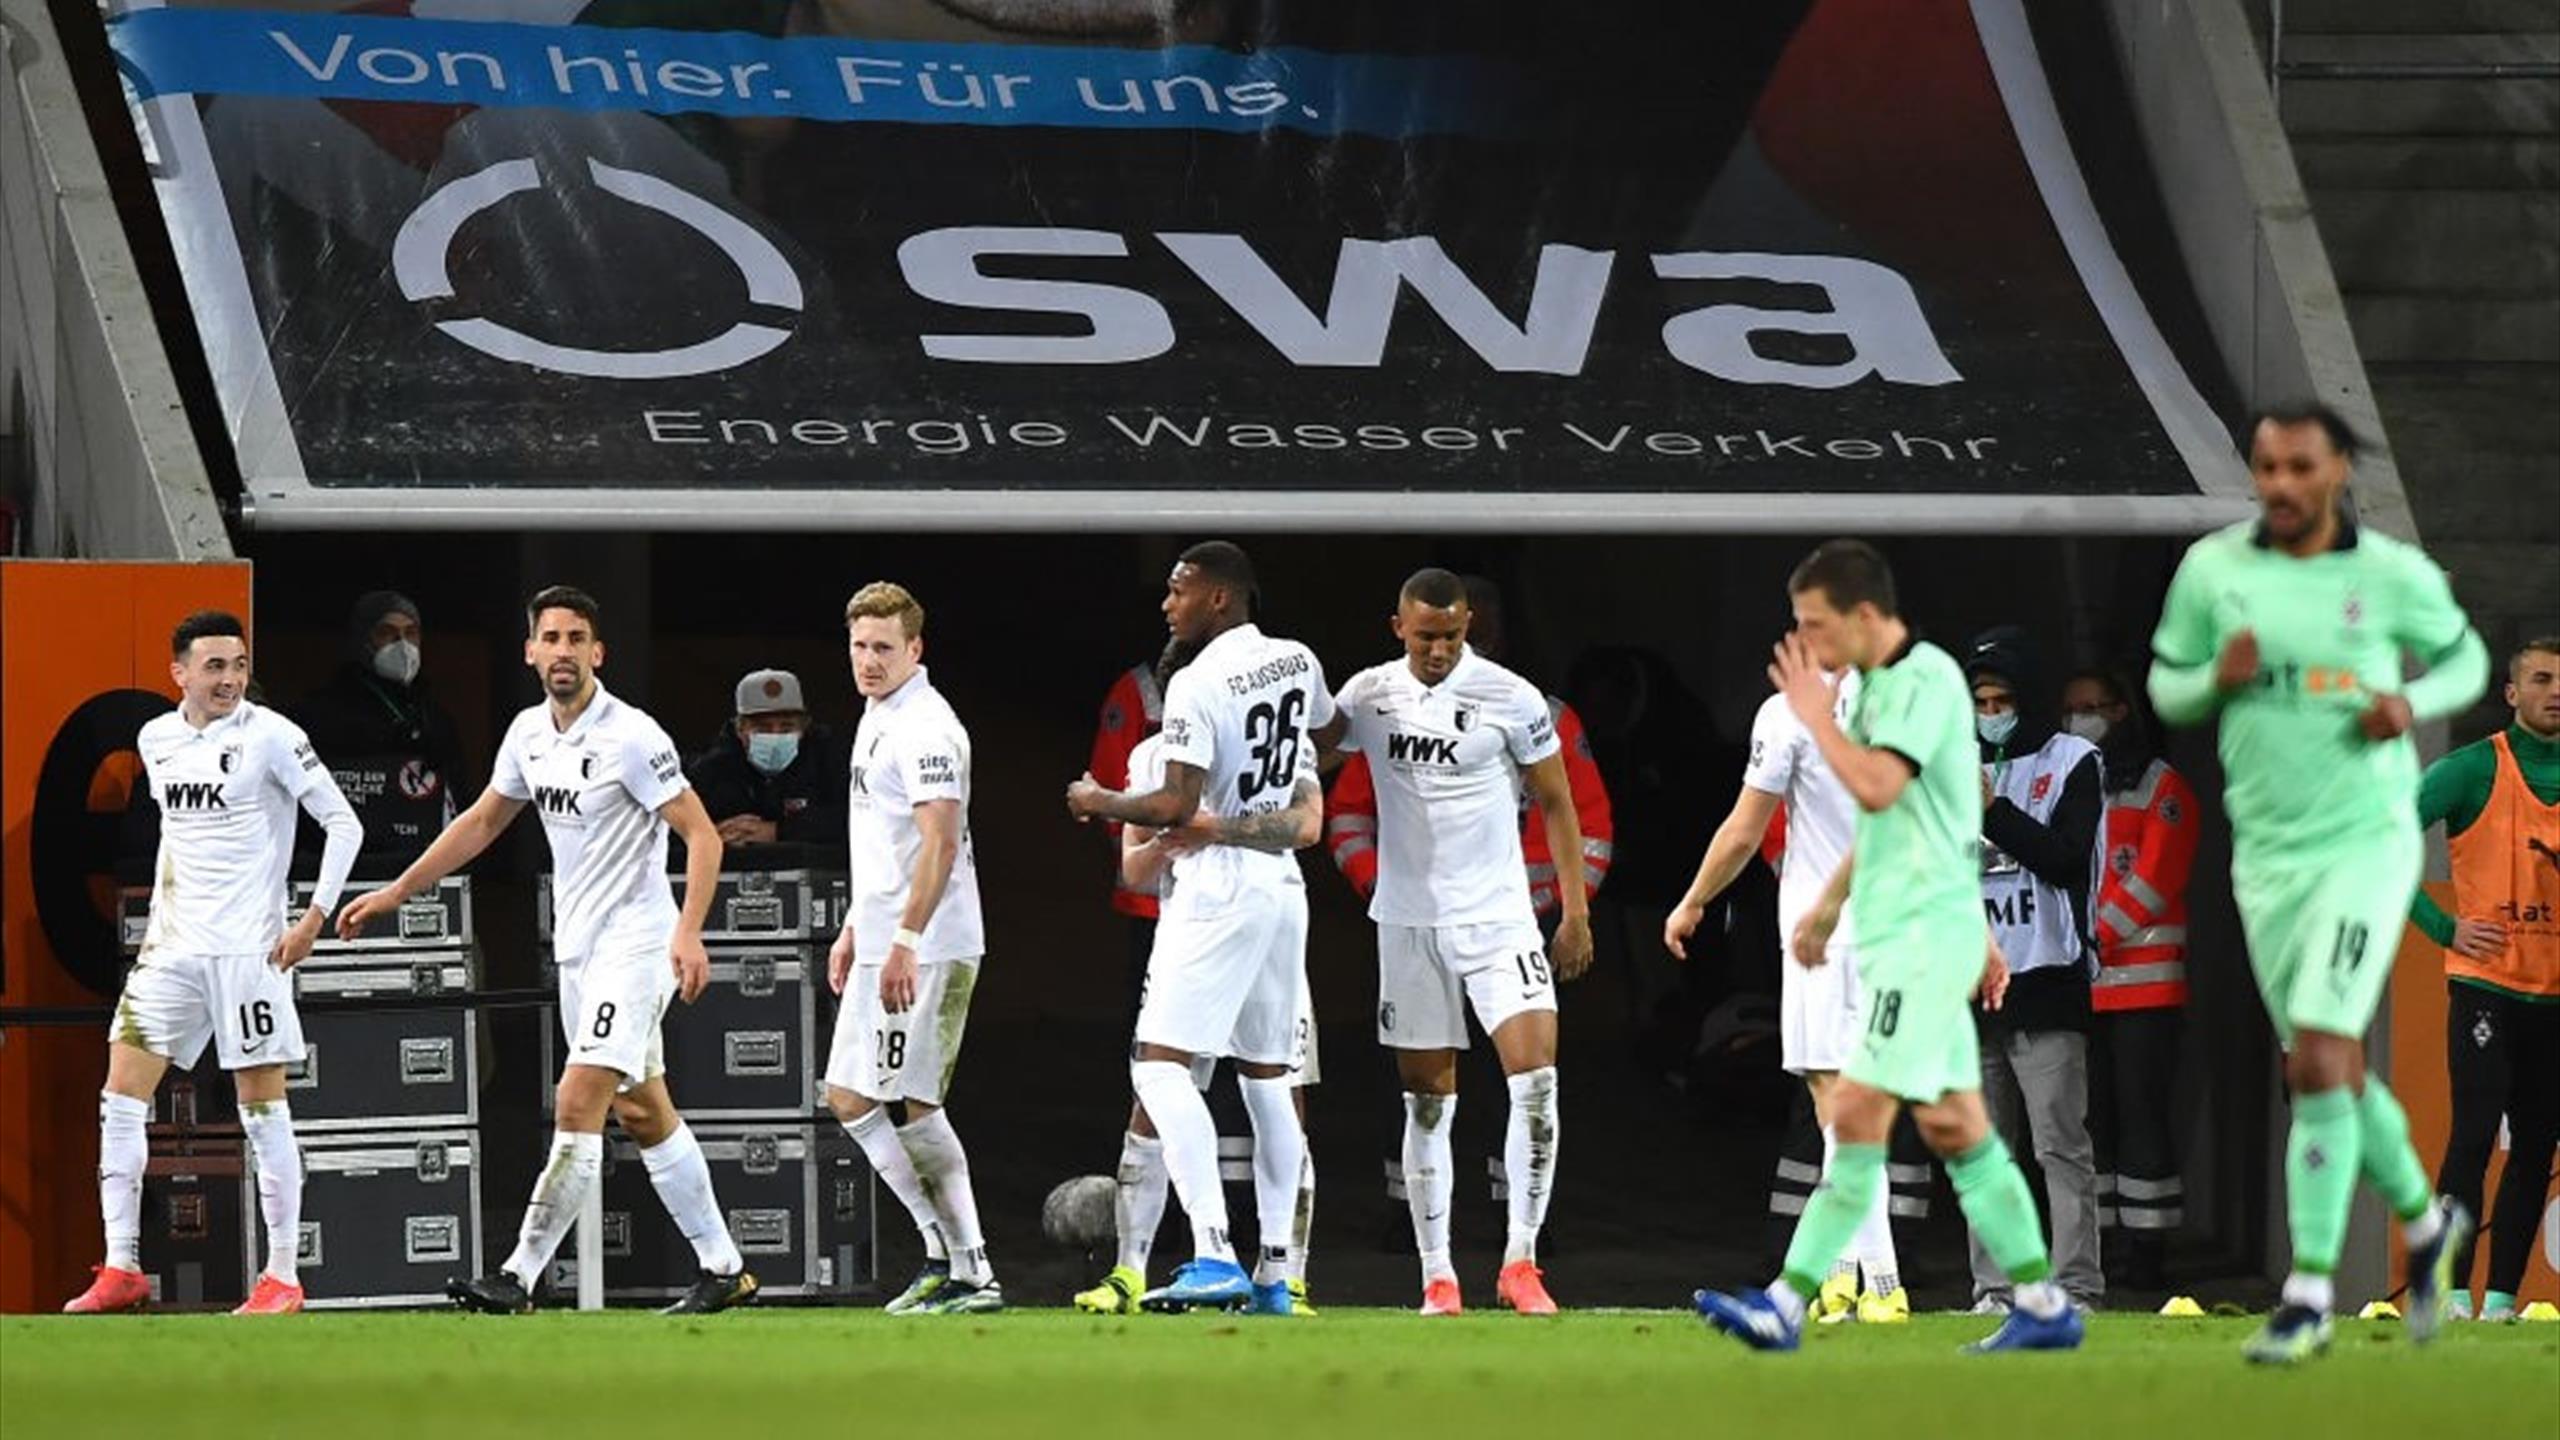 Borussia Monchengladbach crisis deepens with 3-1 loss at Augsburg as  European hopes suffer blow - Eurosport